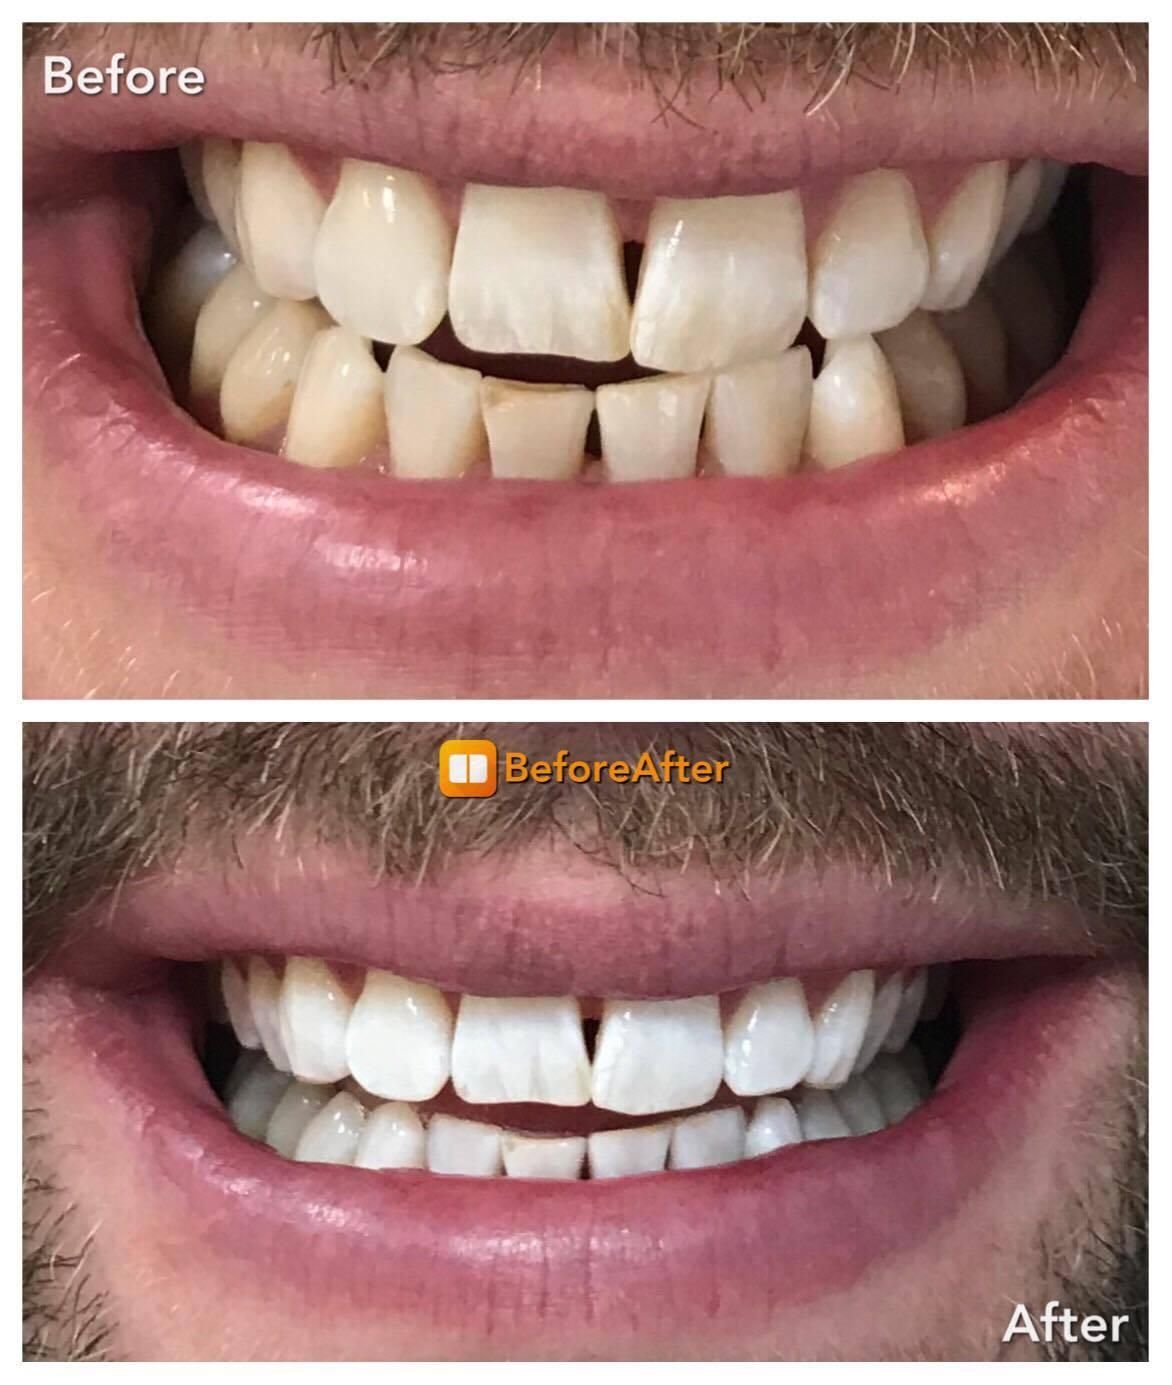 Teeth Whitening / Teeth cleaning with B24